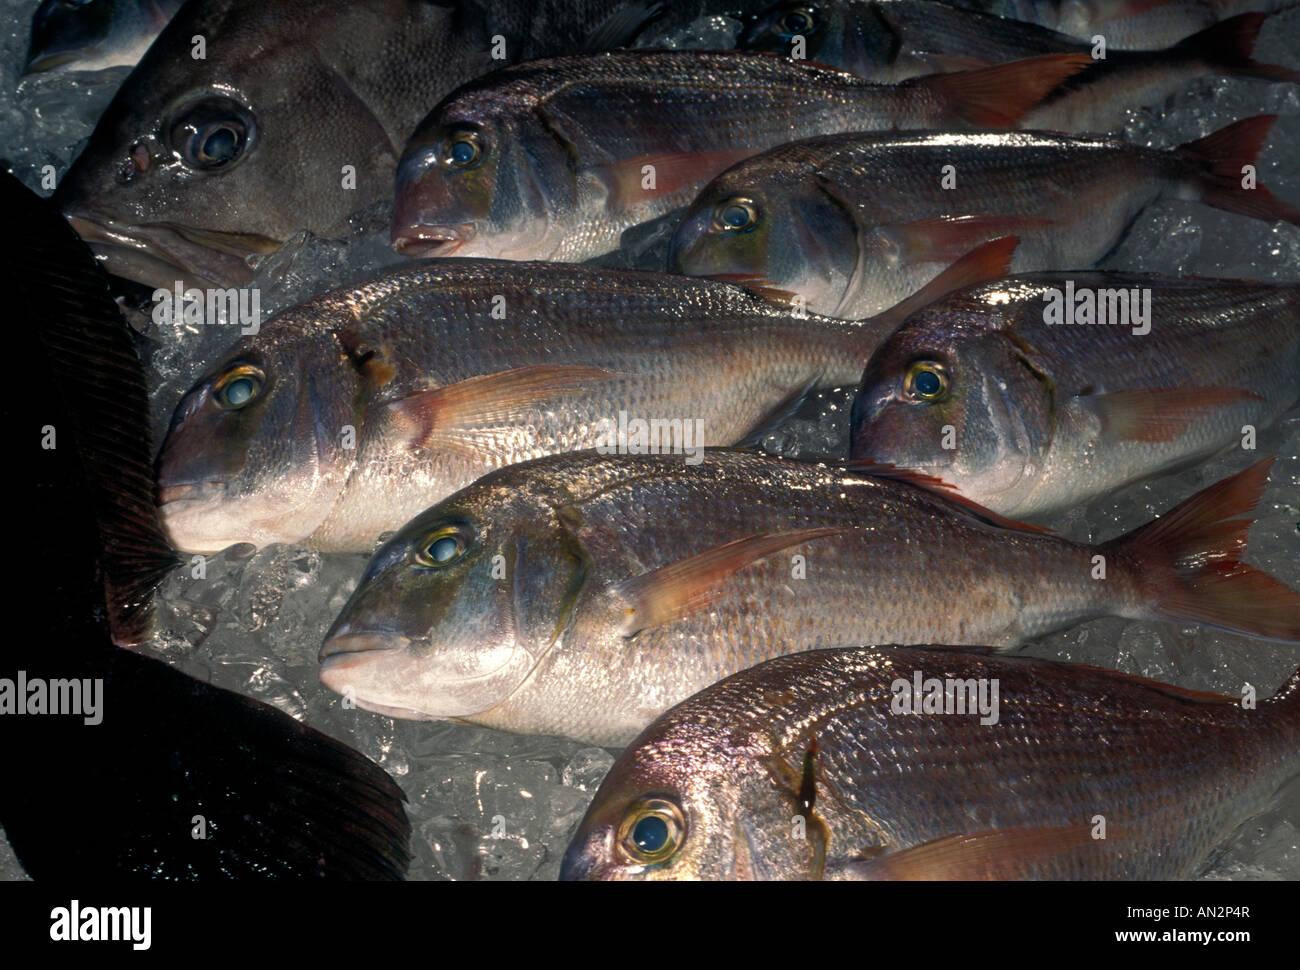 Piranha Piranhas Piranha Fish Seafood Restaurant